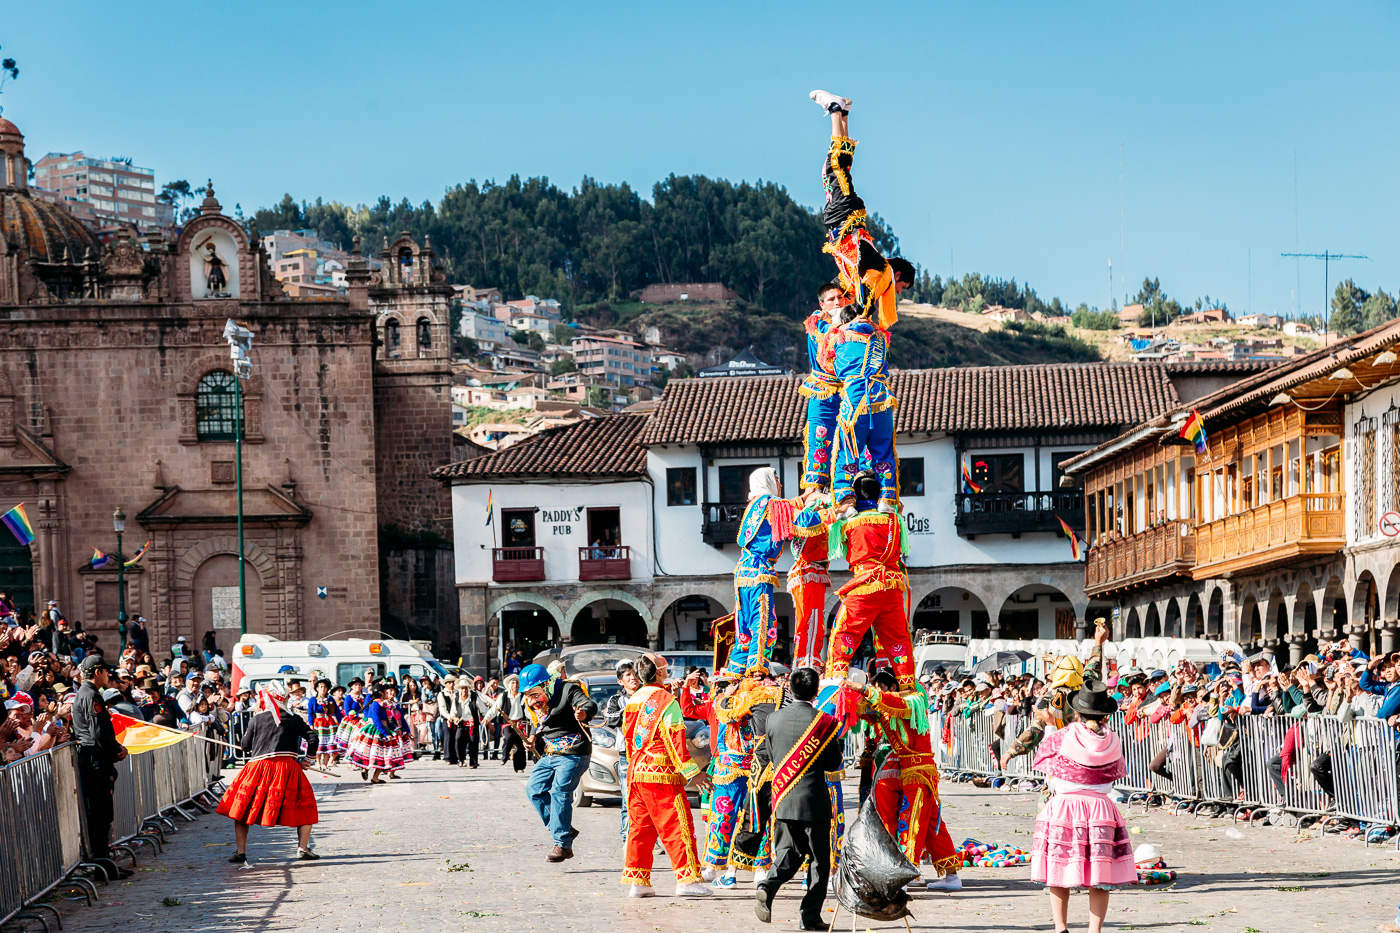 Cusco Inti Raymi Festival -16- June 2015